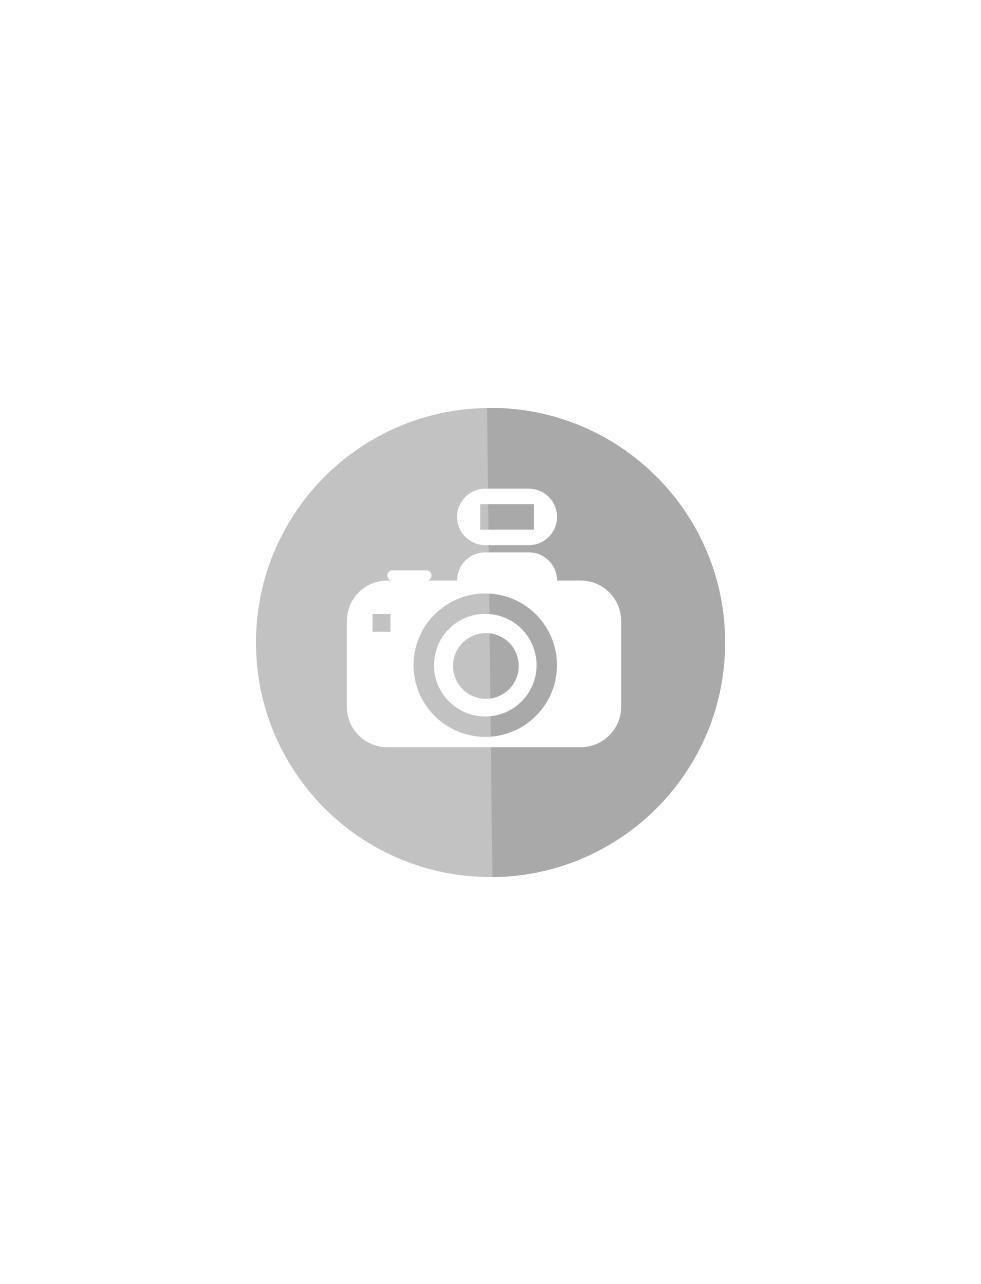 category_image_BUNDLES